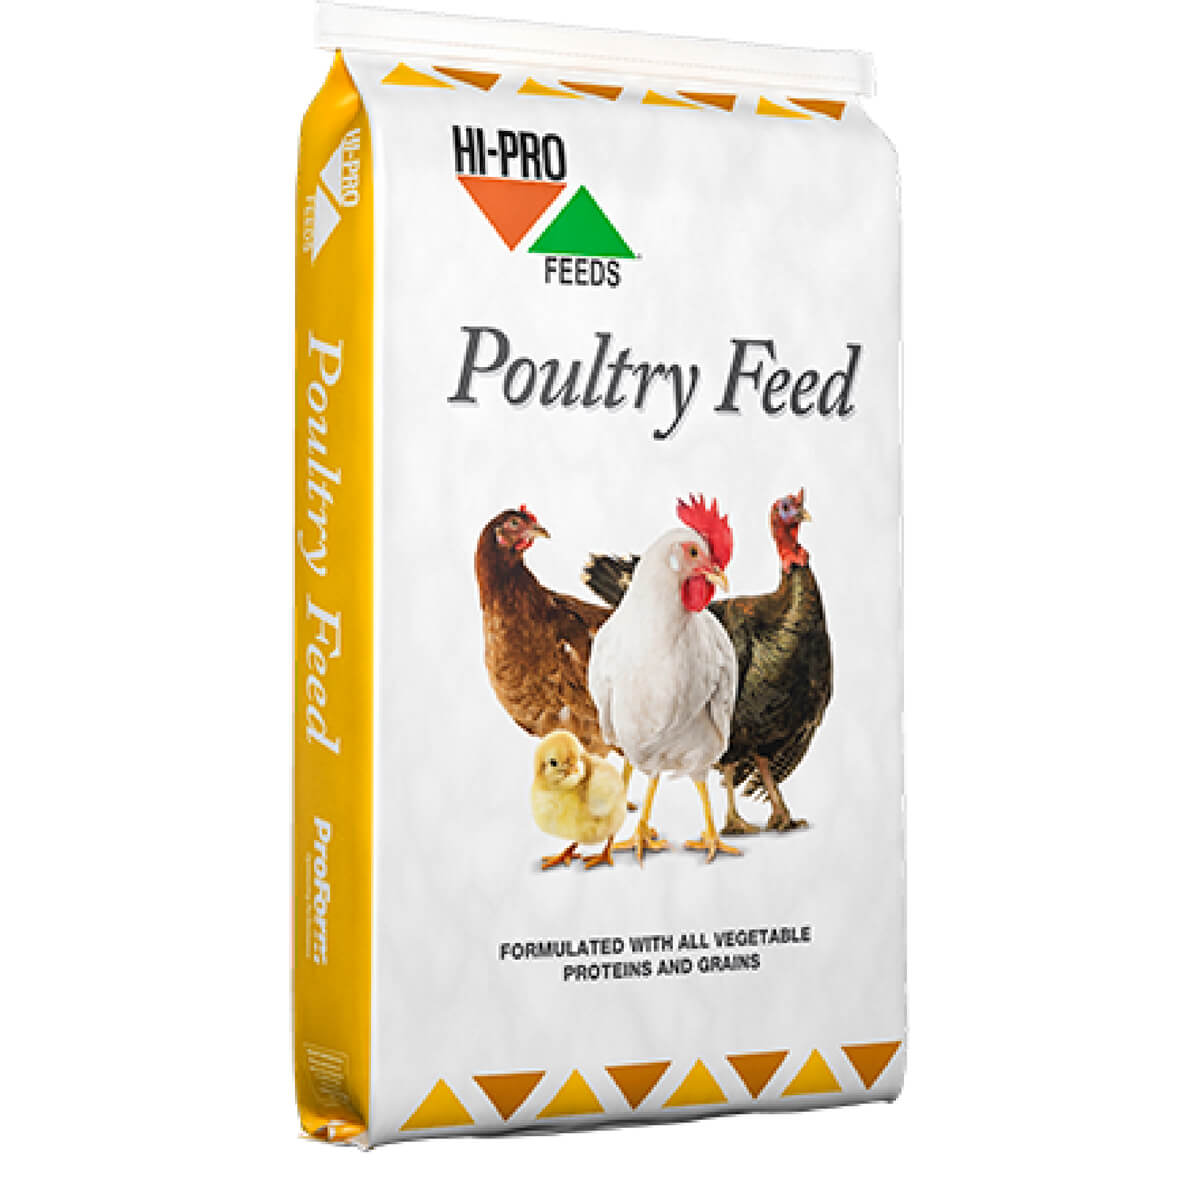 Hi-Pro 22% Turkey Grower - 20 kg